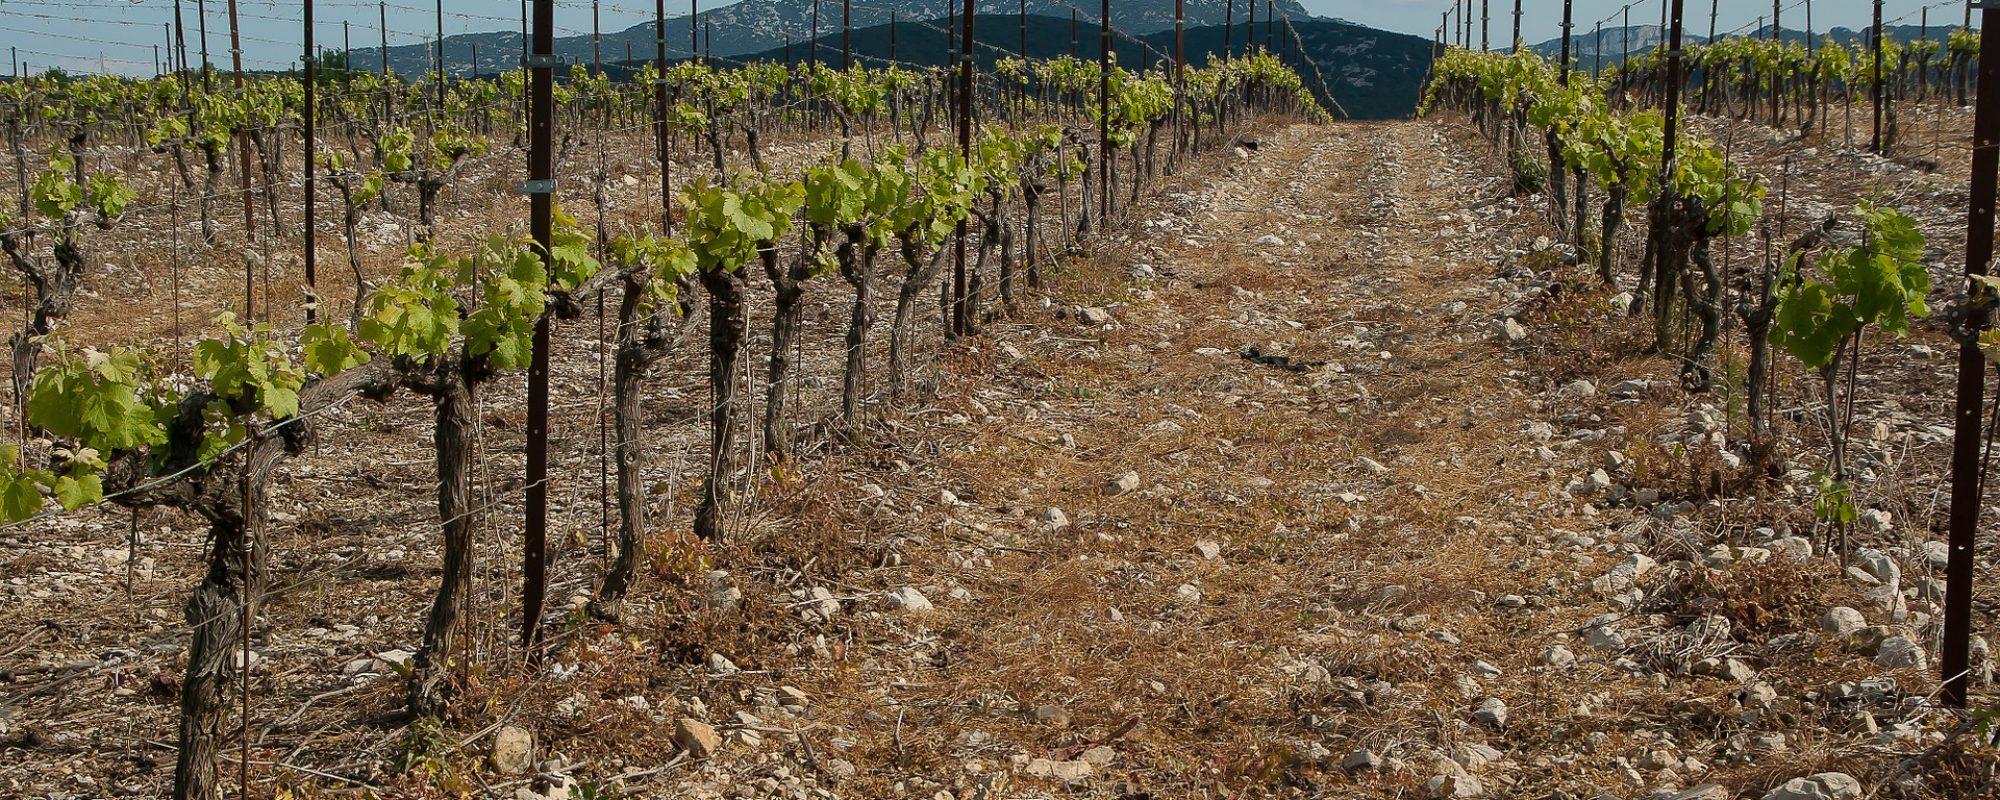 vineyard-1371348_1920